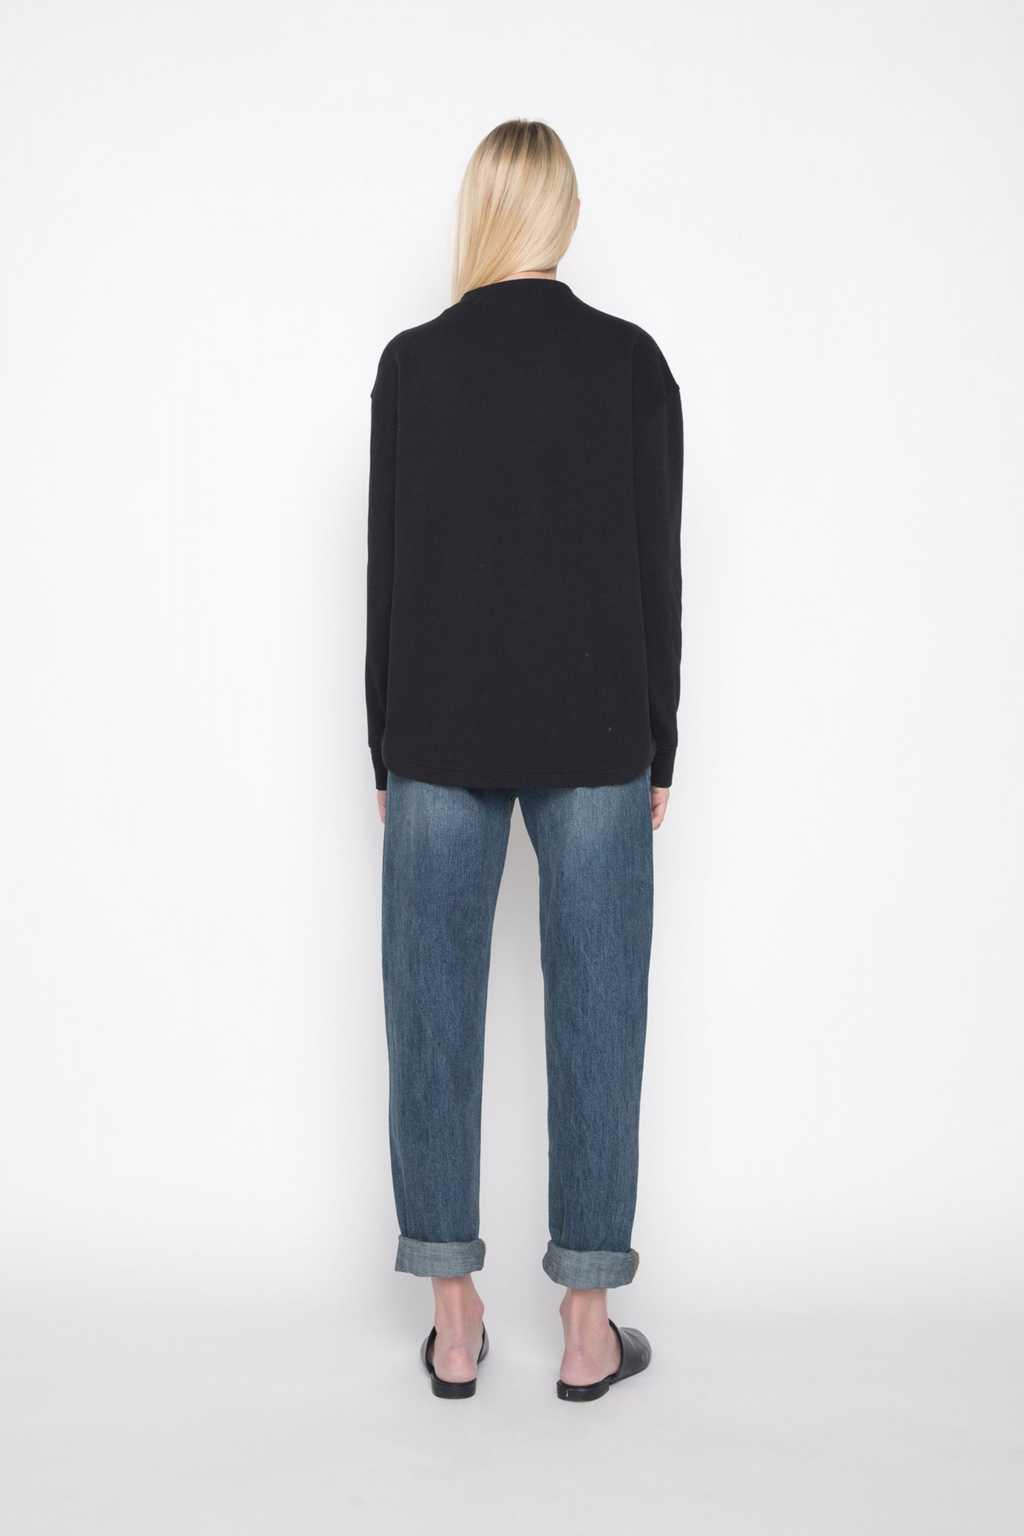 Mock Neck Sweater 1004 Black 4